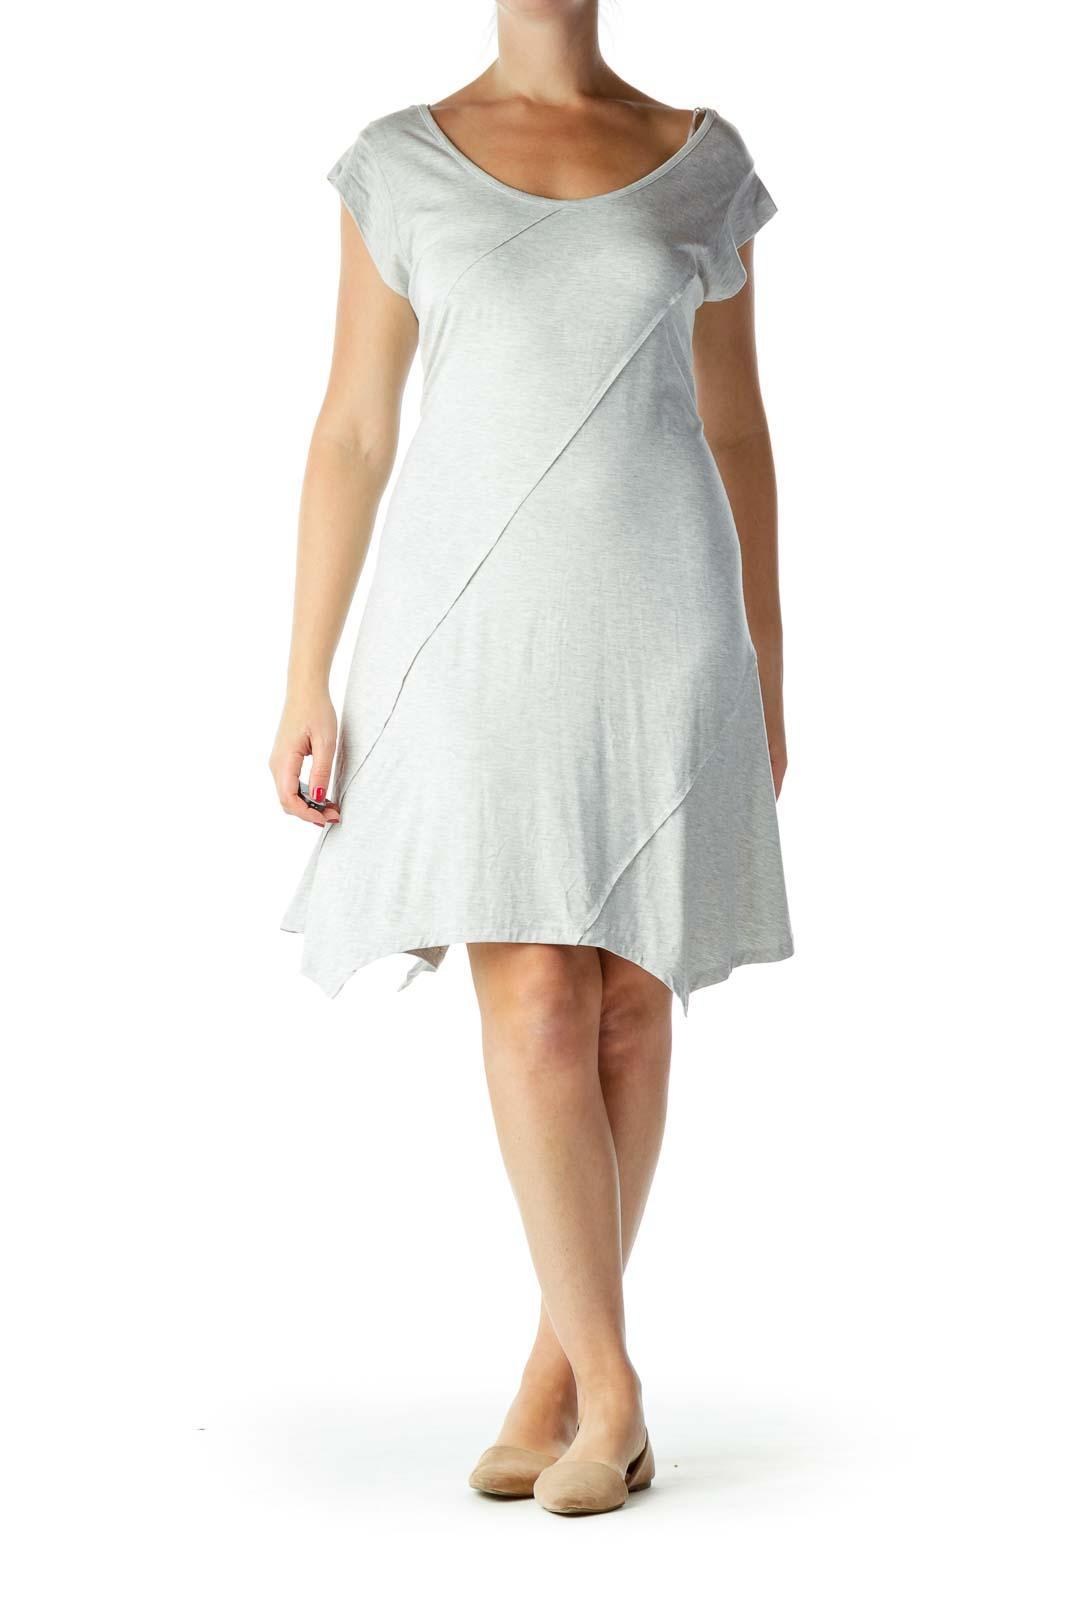 Gray Tent Jersey Dress